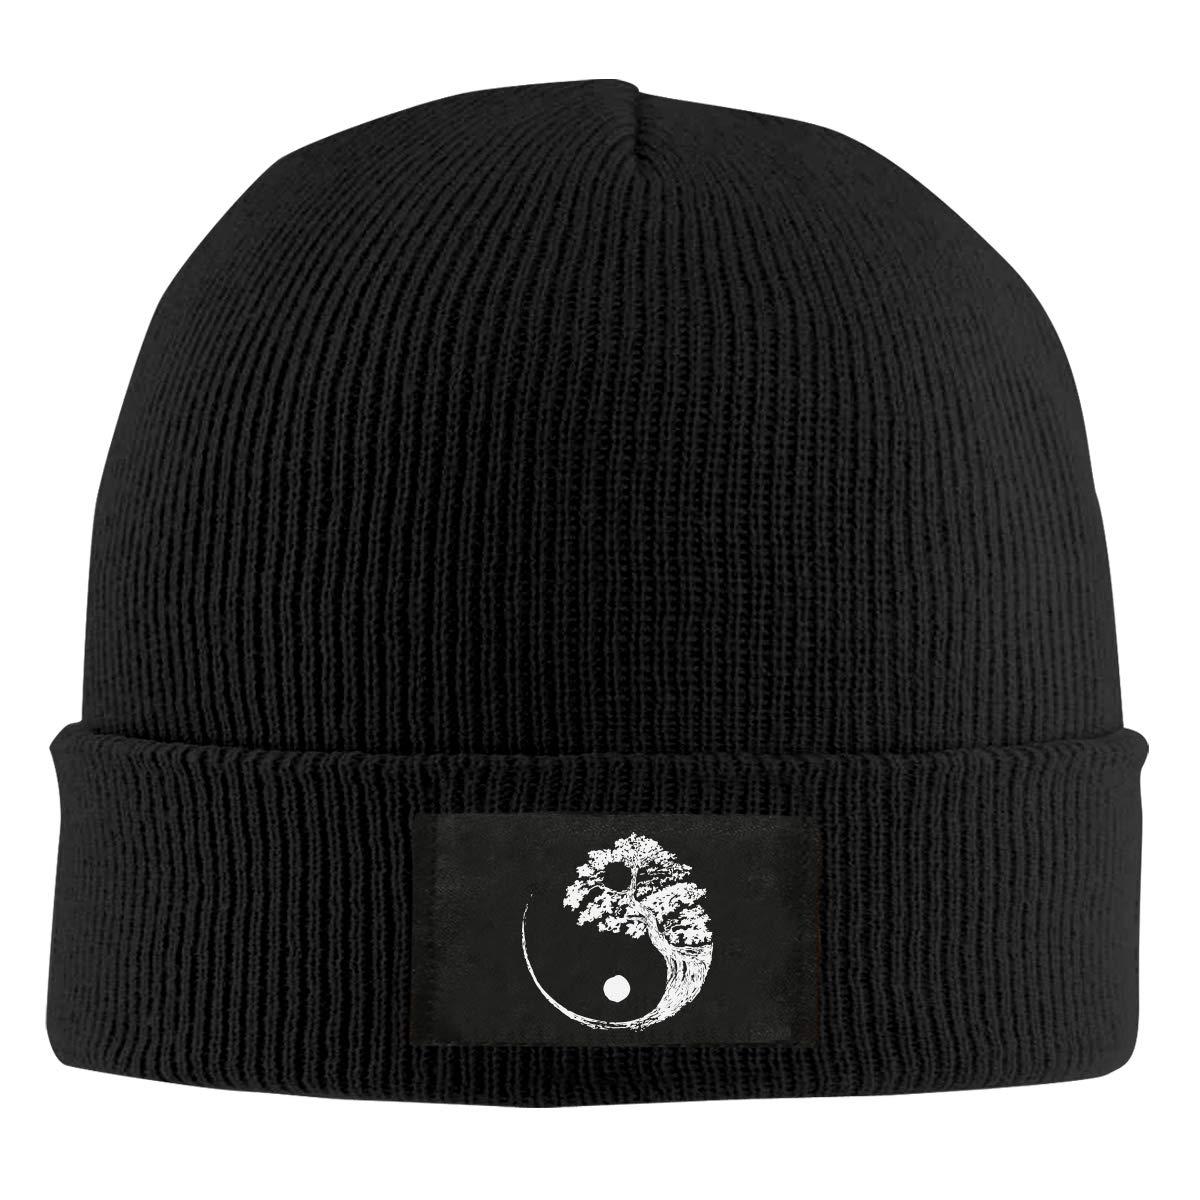 Yin Yang Bonsai Tree Men /& Womens Knitted Hat Fashion Warm Snowboarding Hat